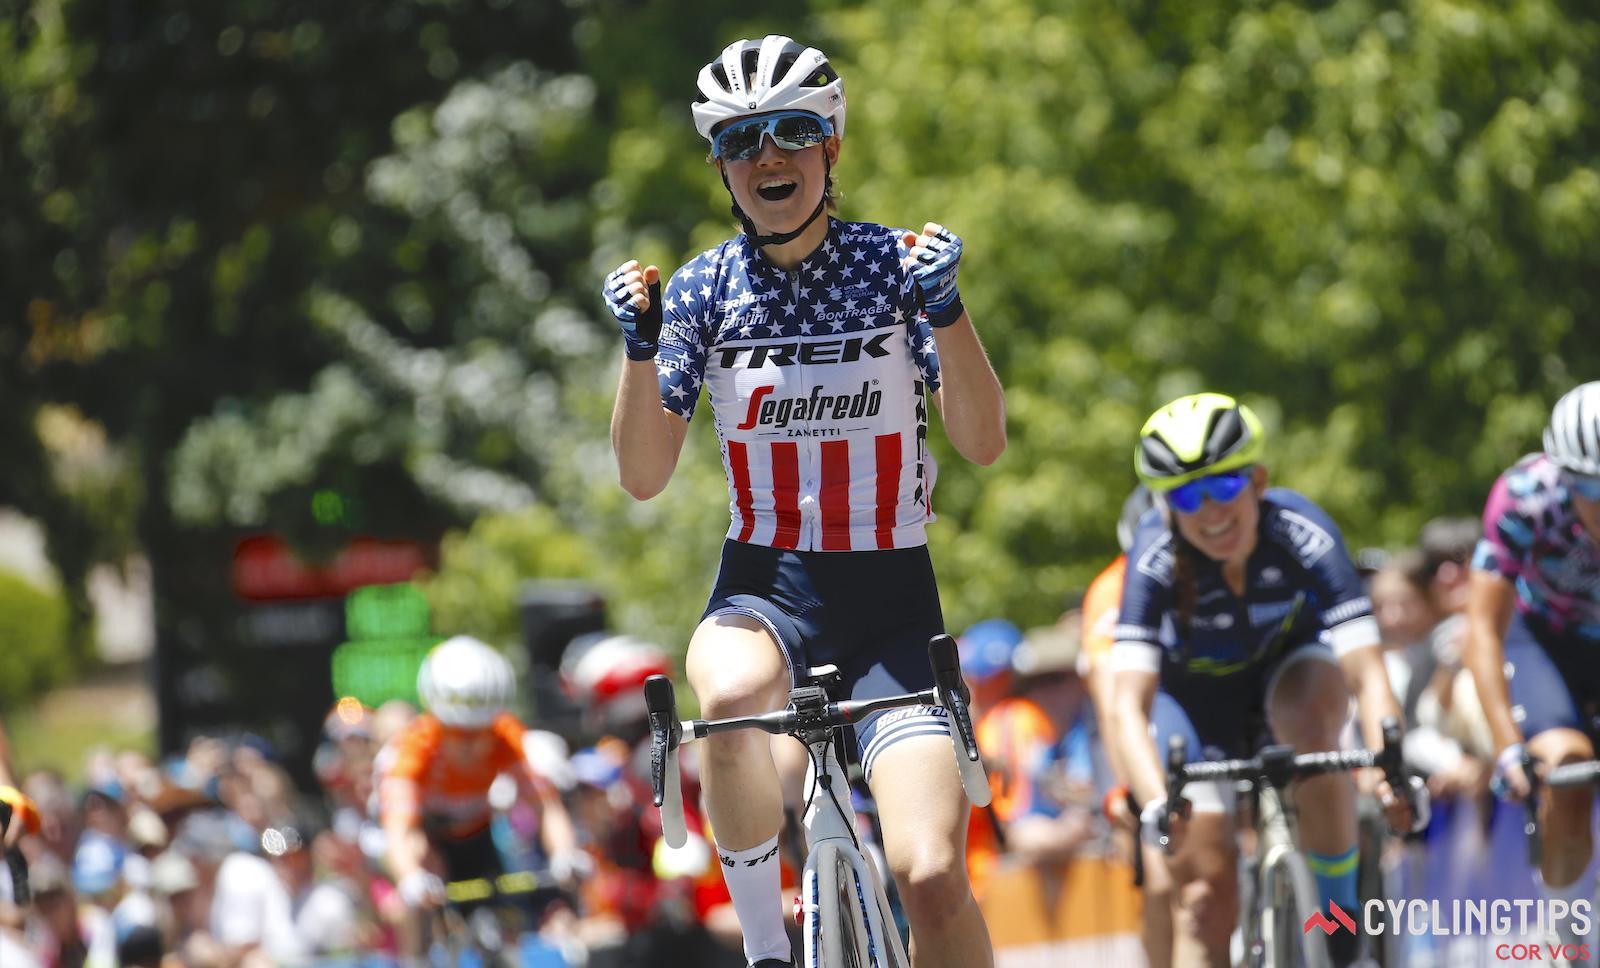 How Ruth Winder dethroned Amanda Spratt to lead the Women's Tour Down Under